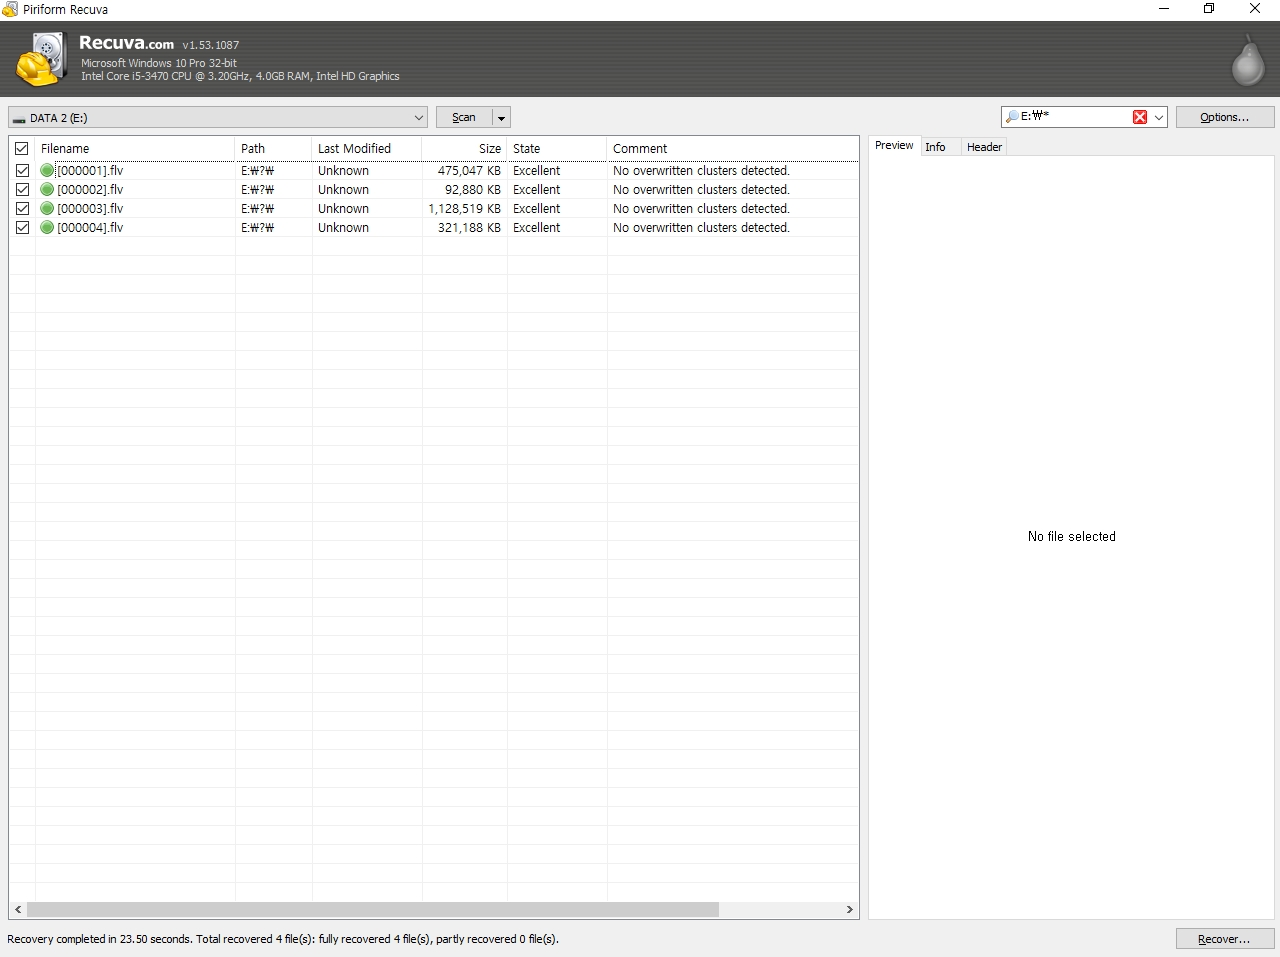 Flv files on thumb drive